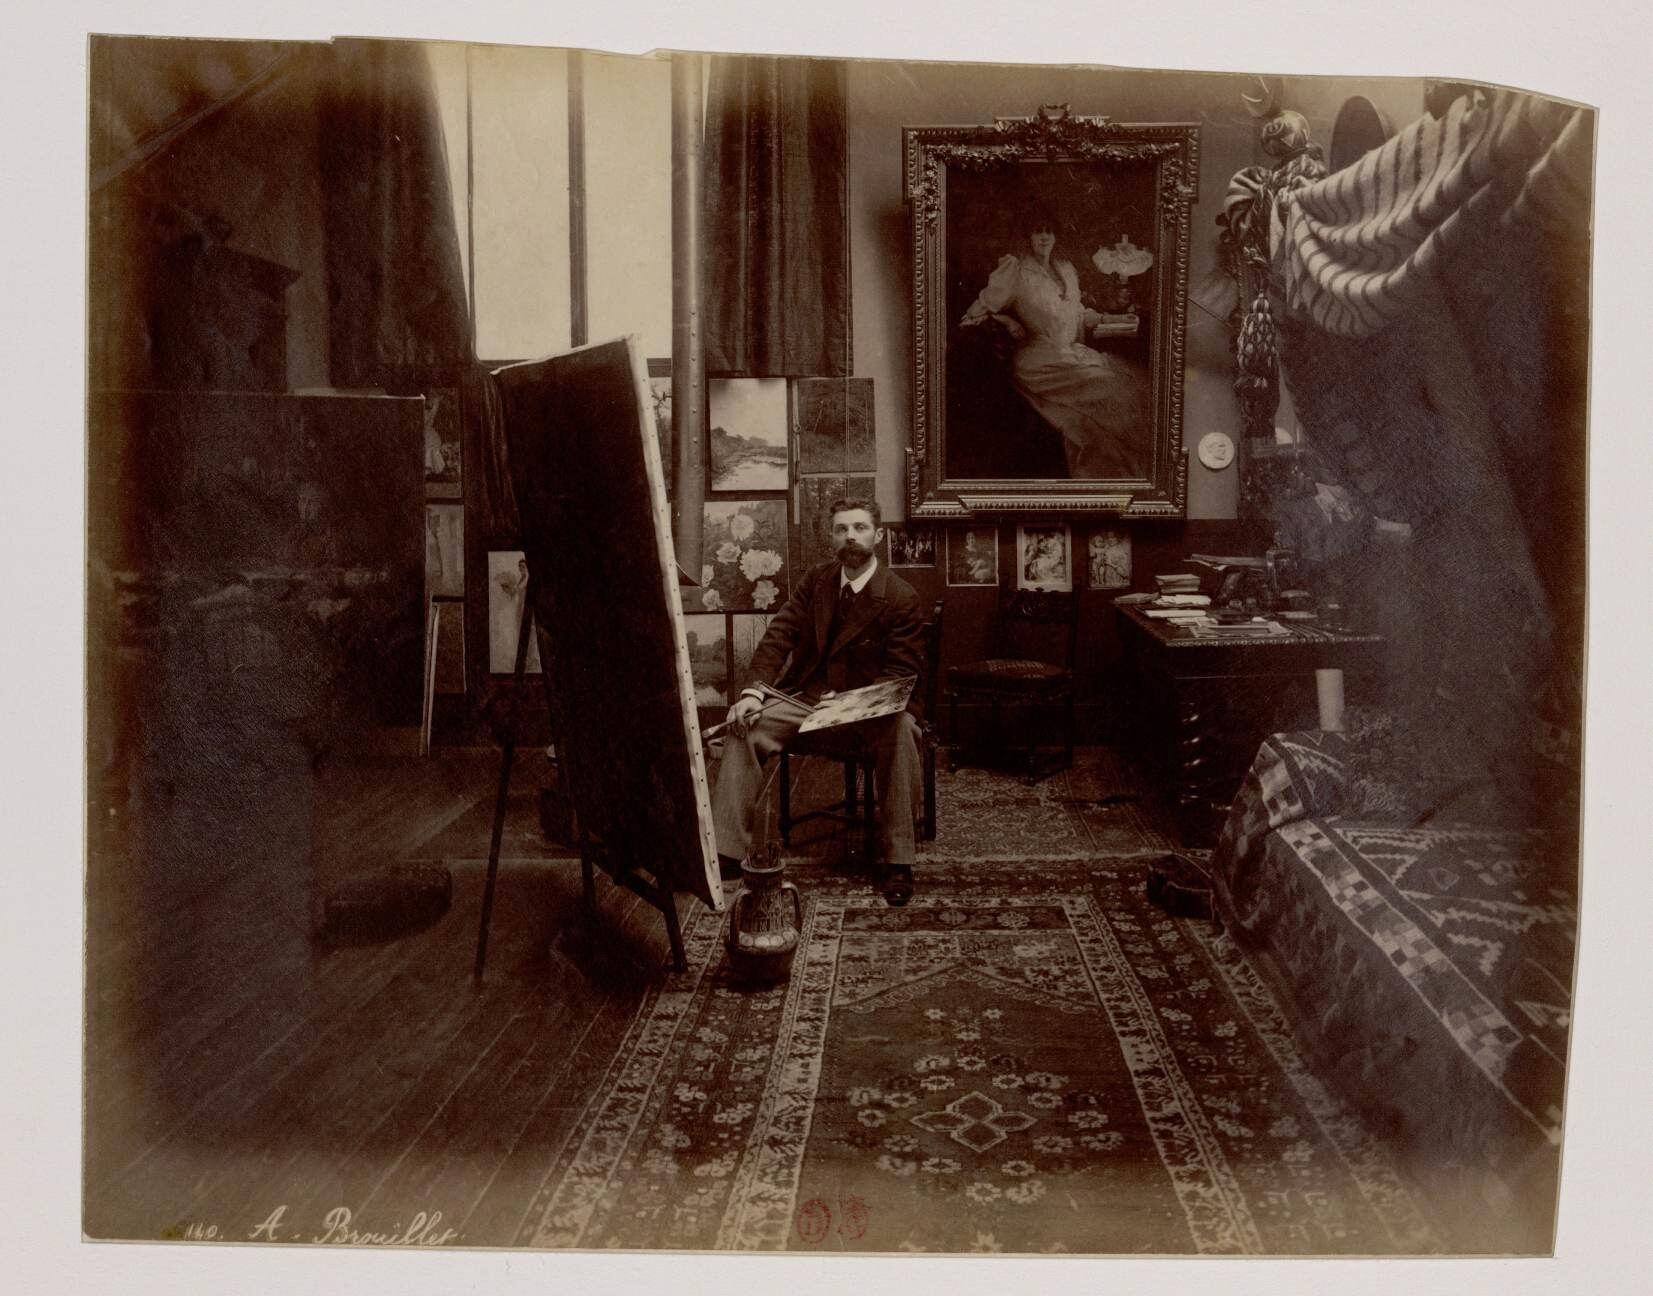 12. Пьер Андре Бруилле (1857-1914) - французский художник